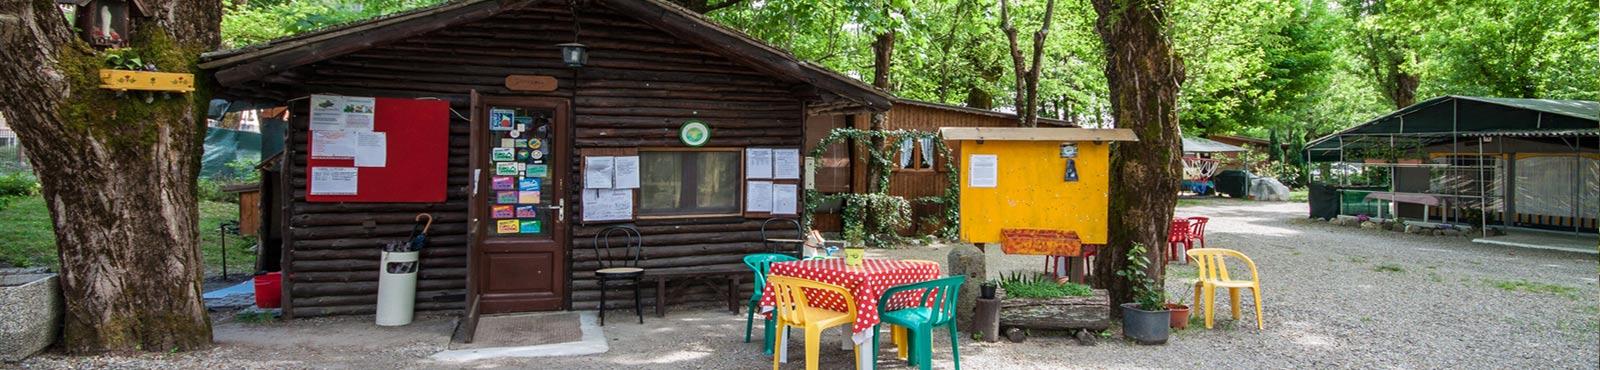 Campingsmall